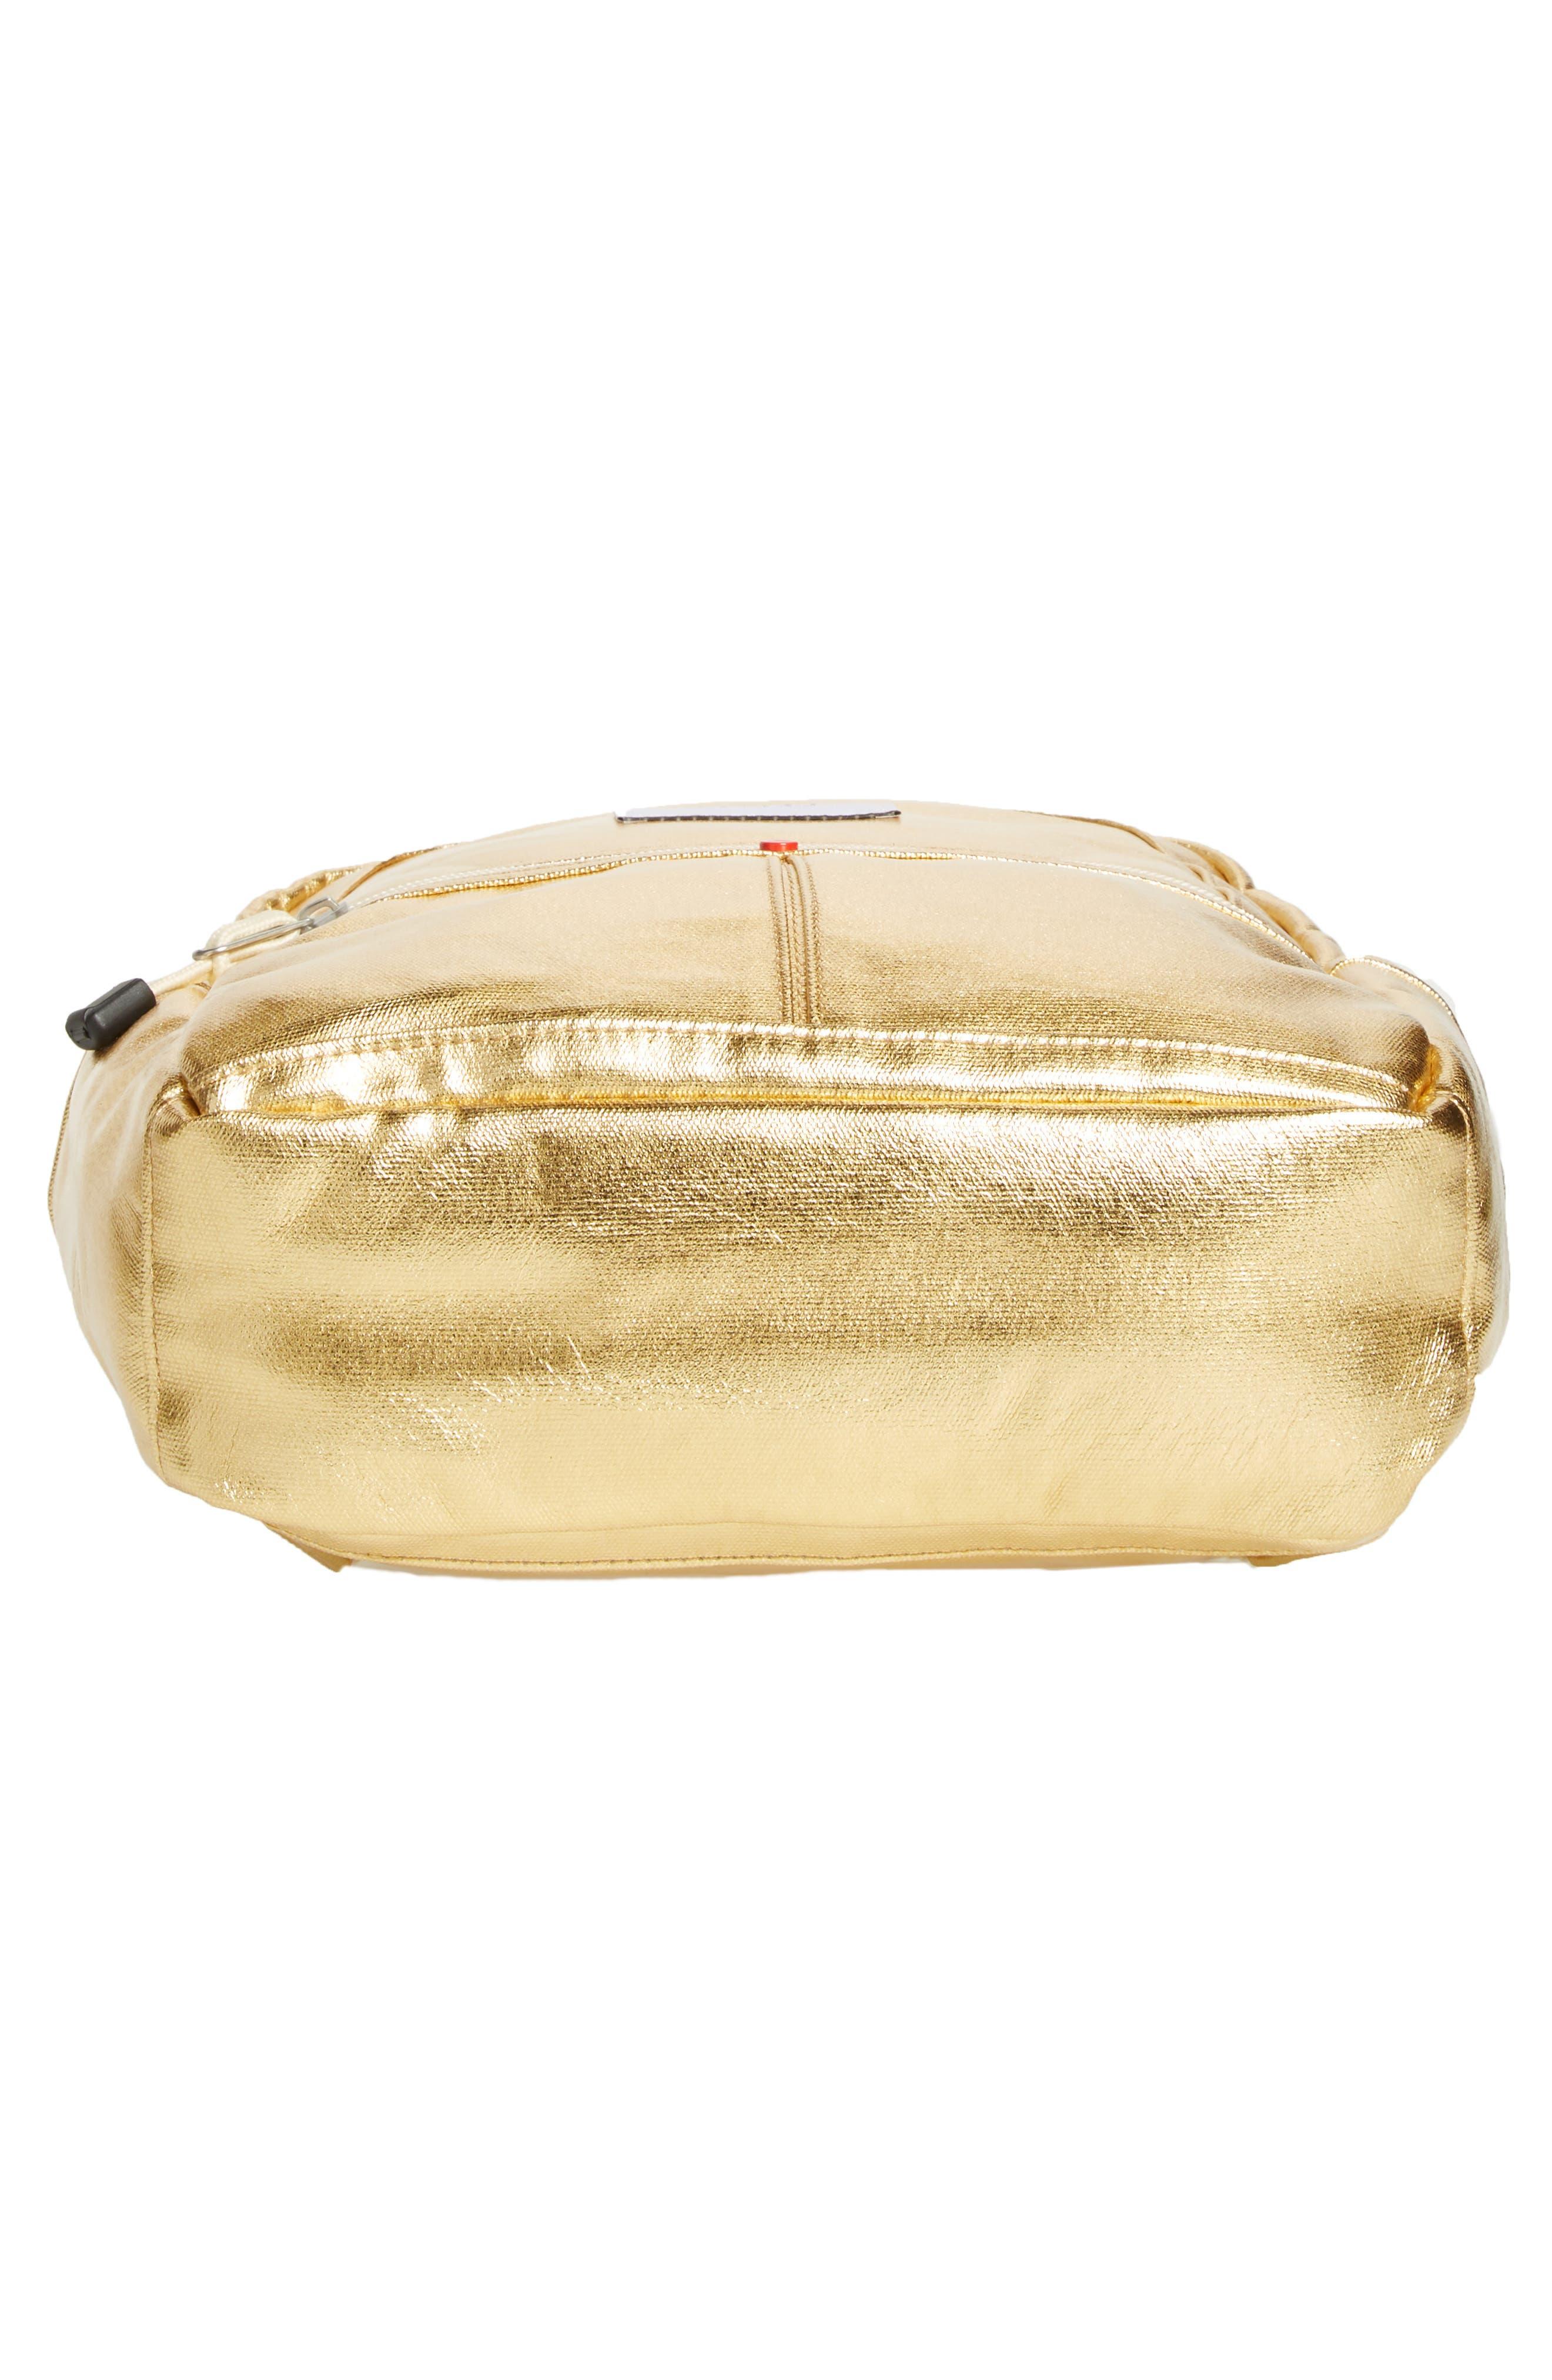 Downtown Mini Kane Metallic Backpack,                             Alternate thumbnail 6, color,                             Gold